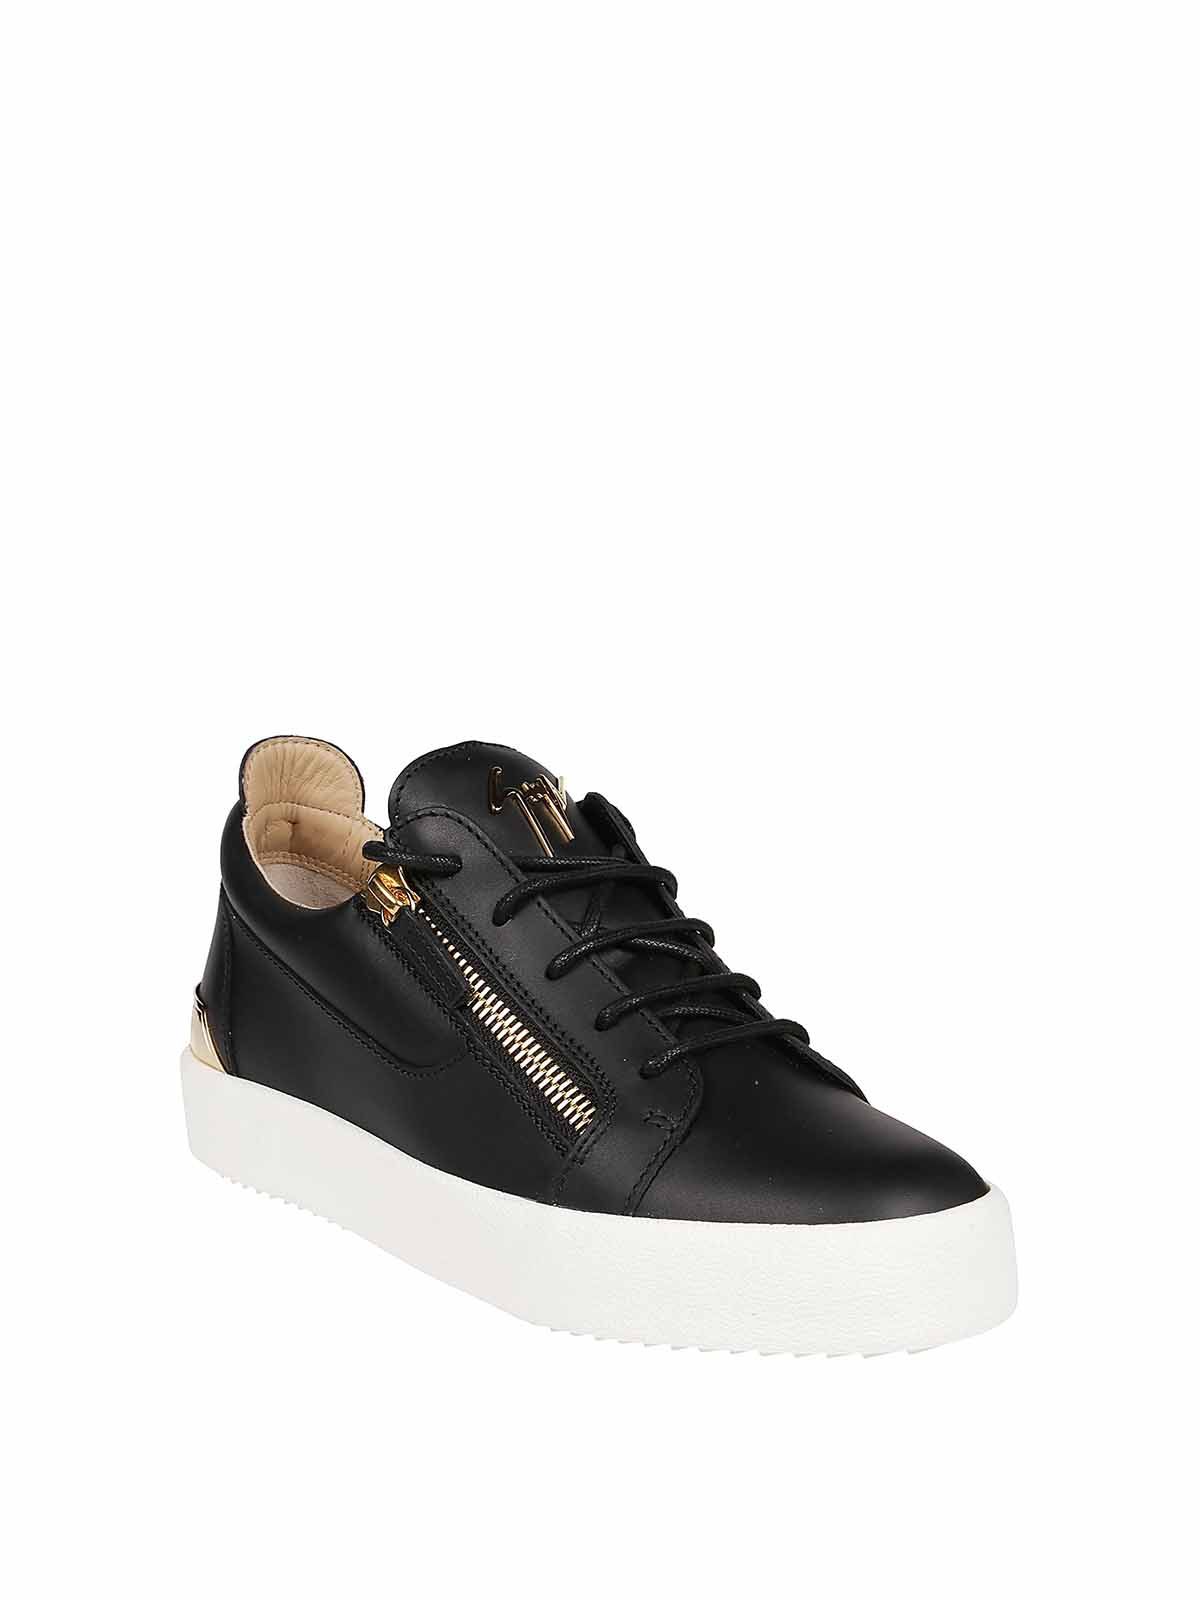 Frankie black leather sneakers